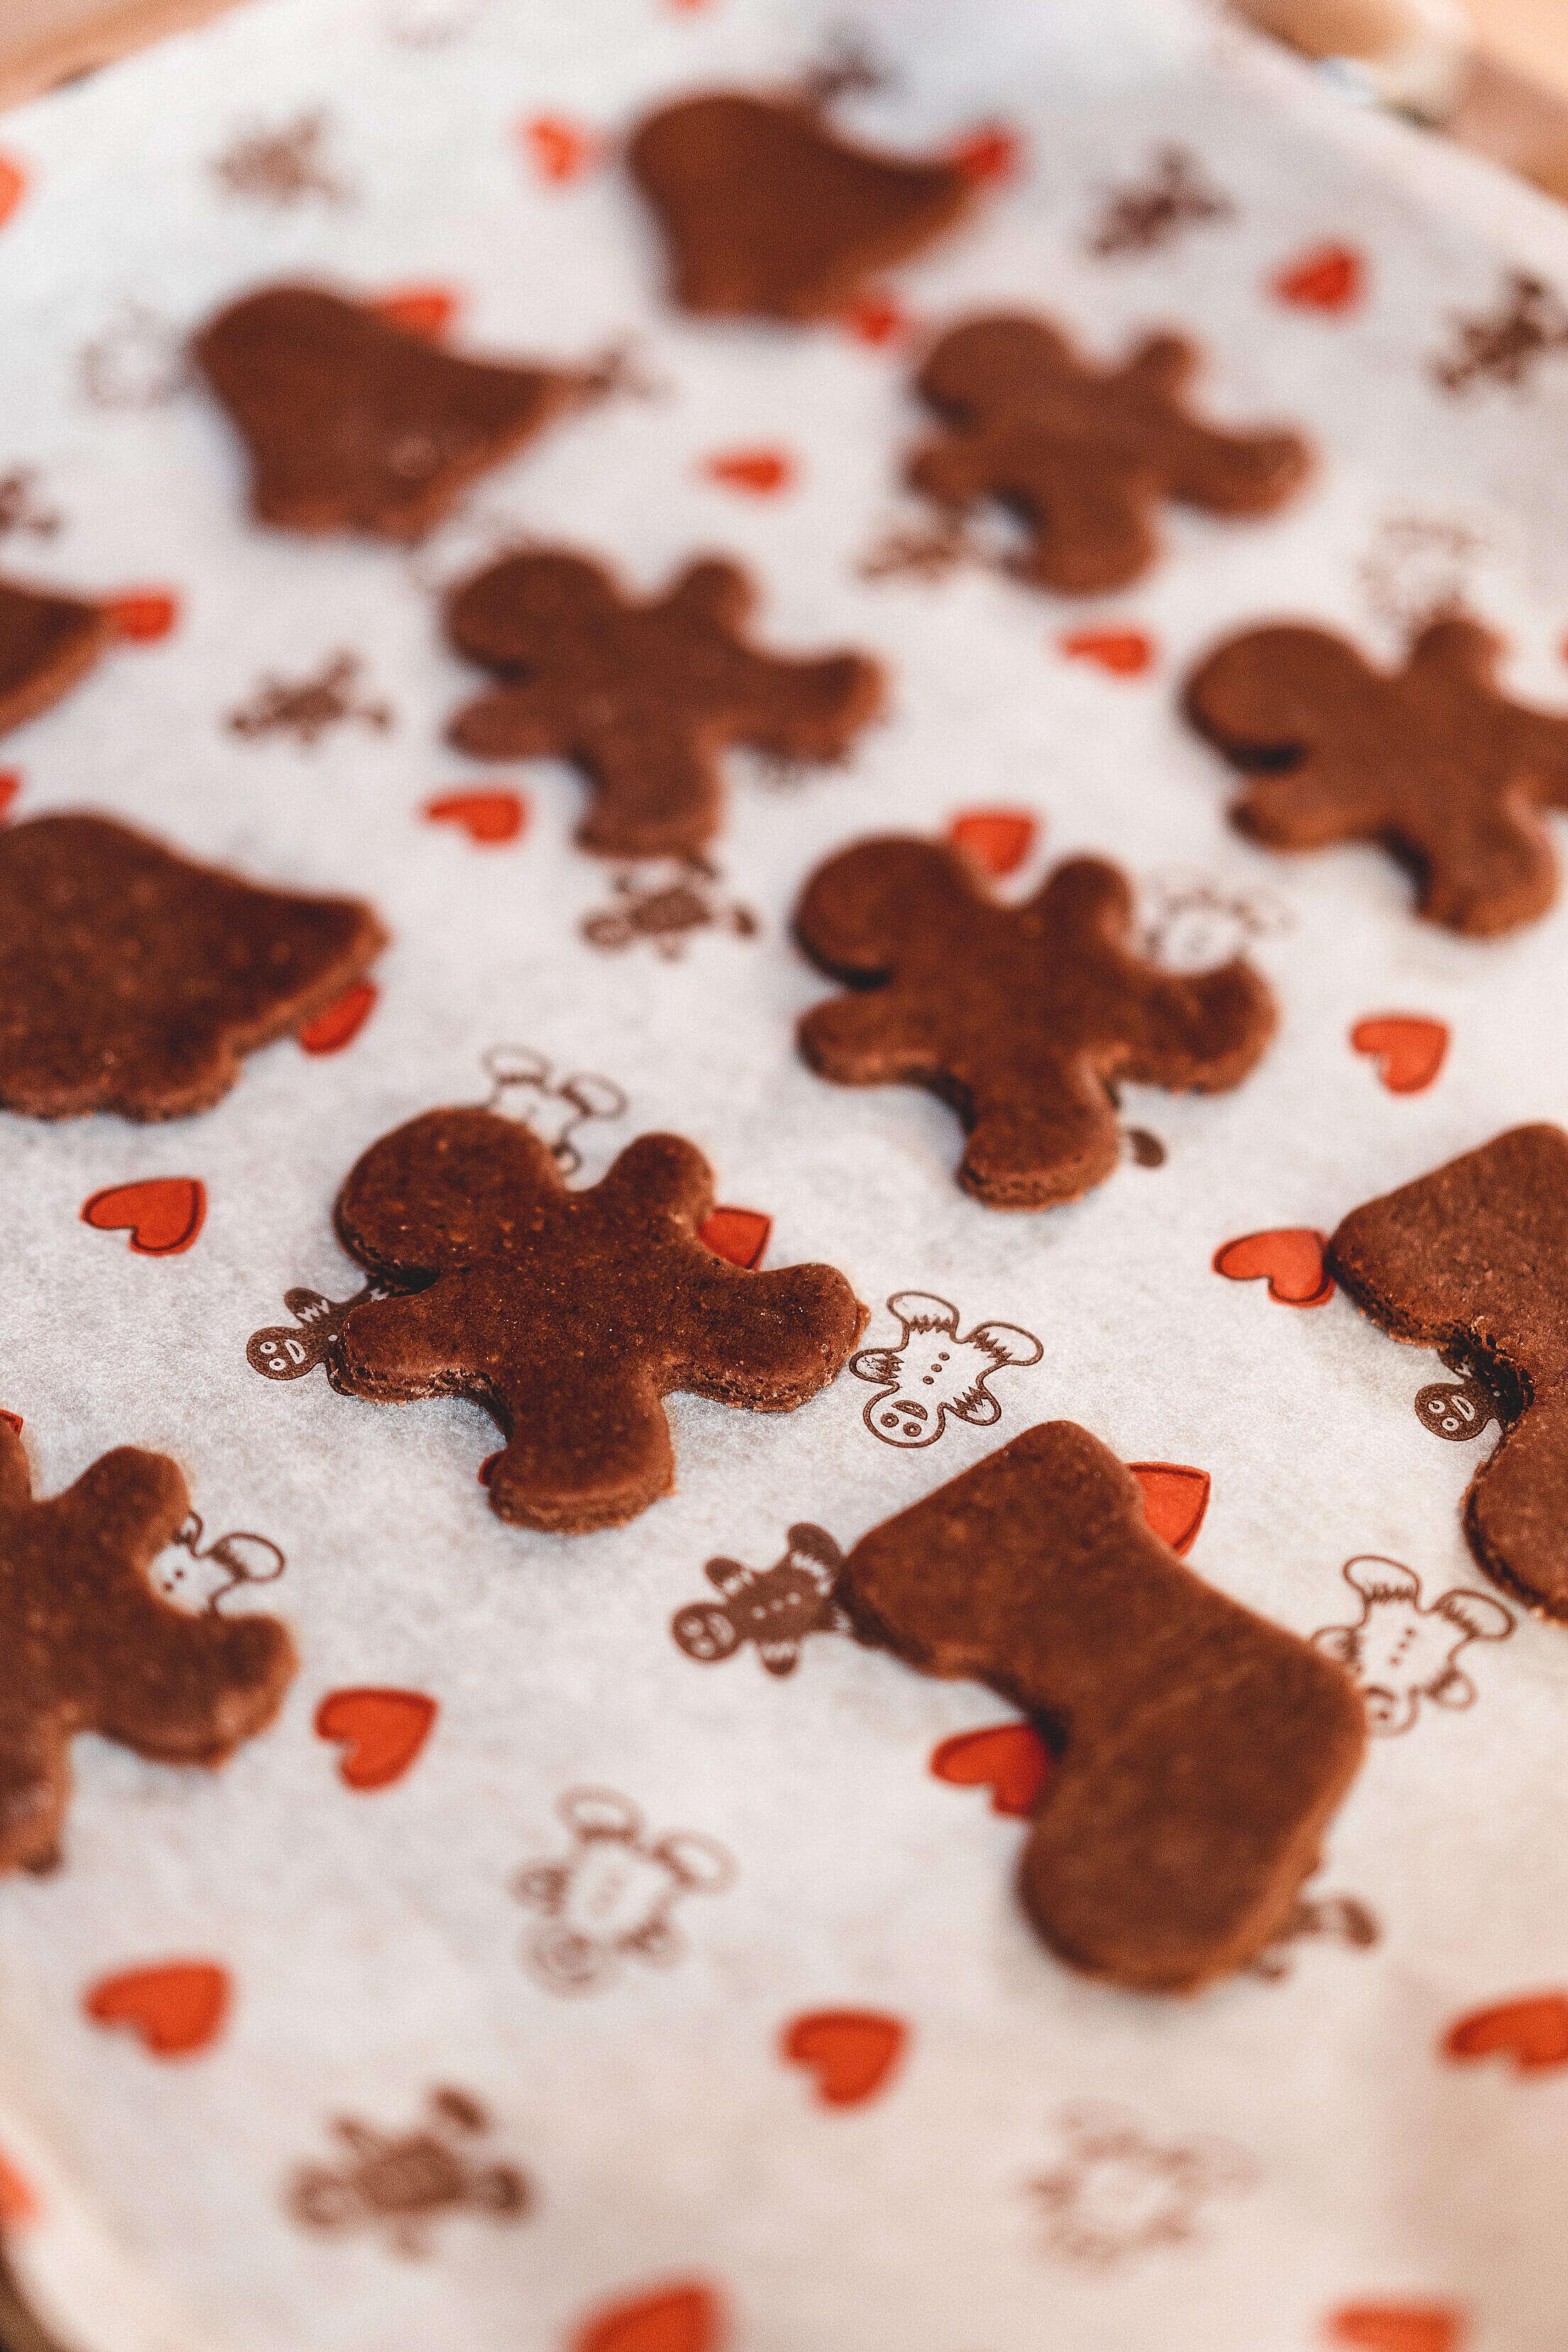 Raw Christmas Gingerbread Free Stock Photo